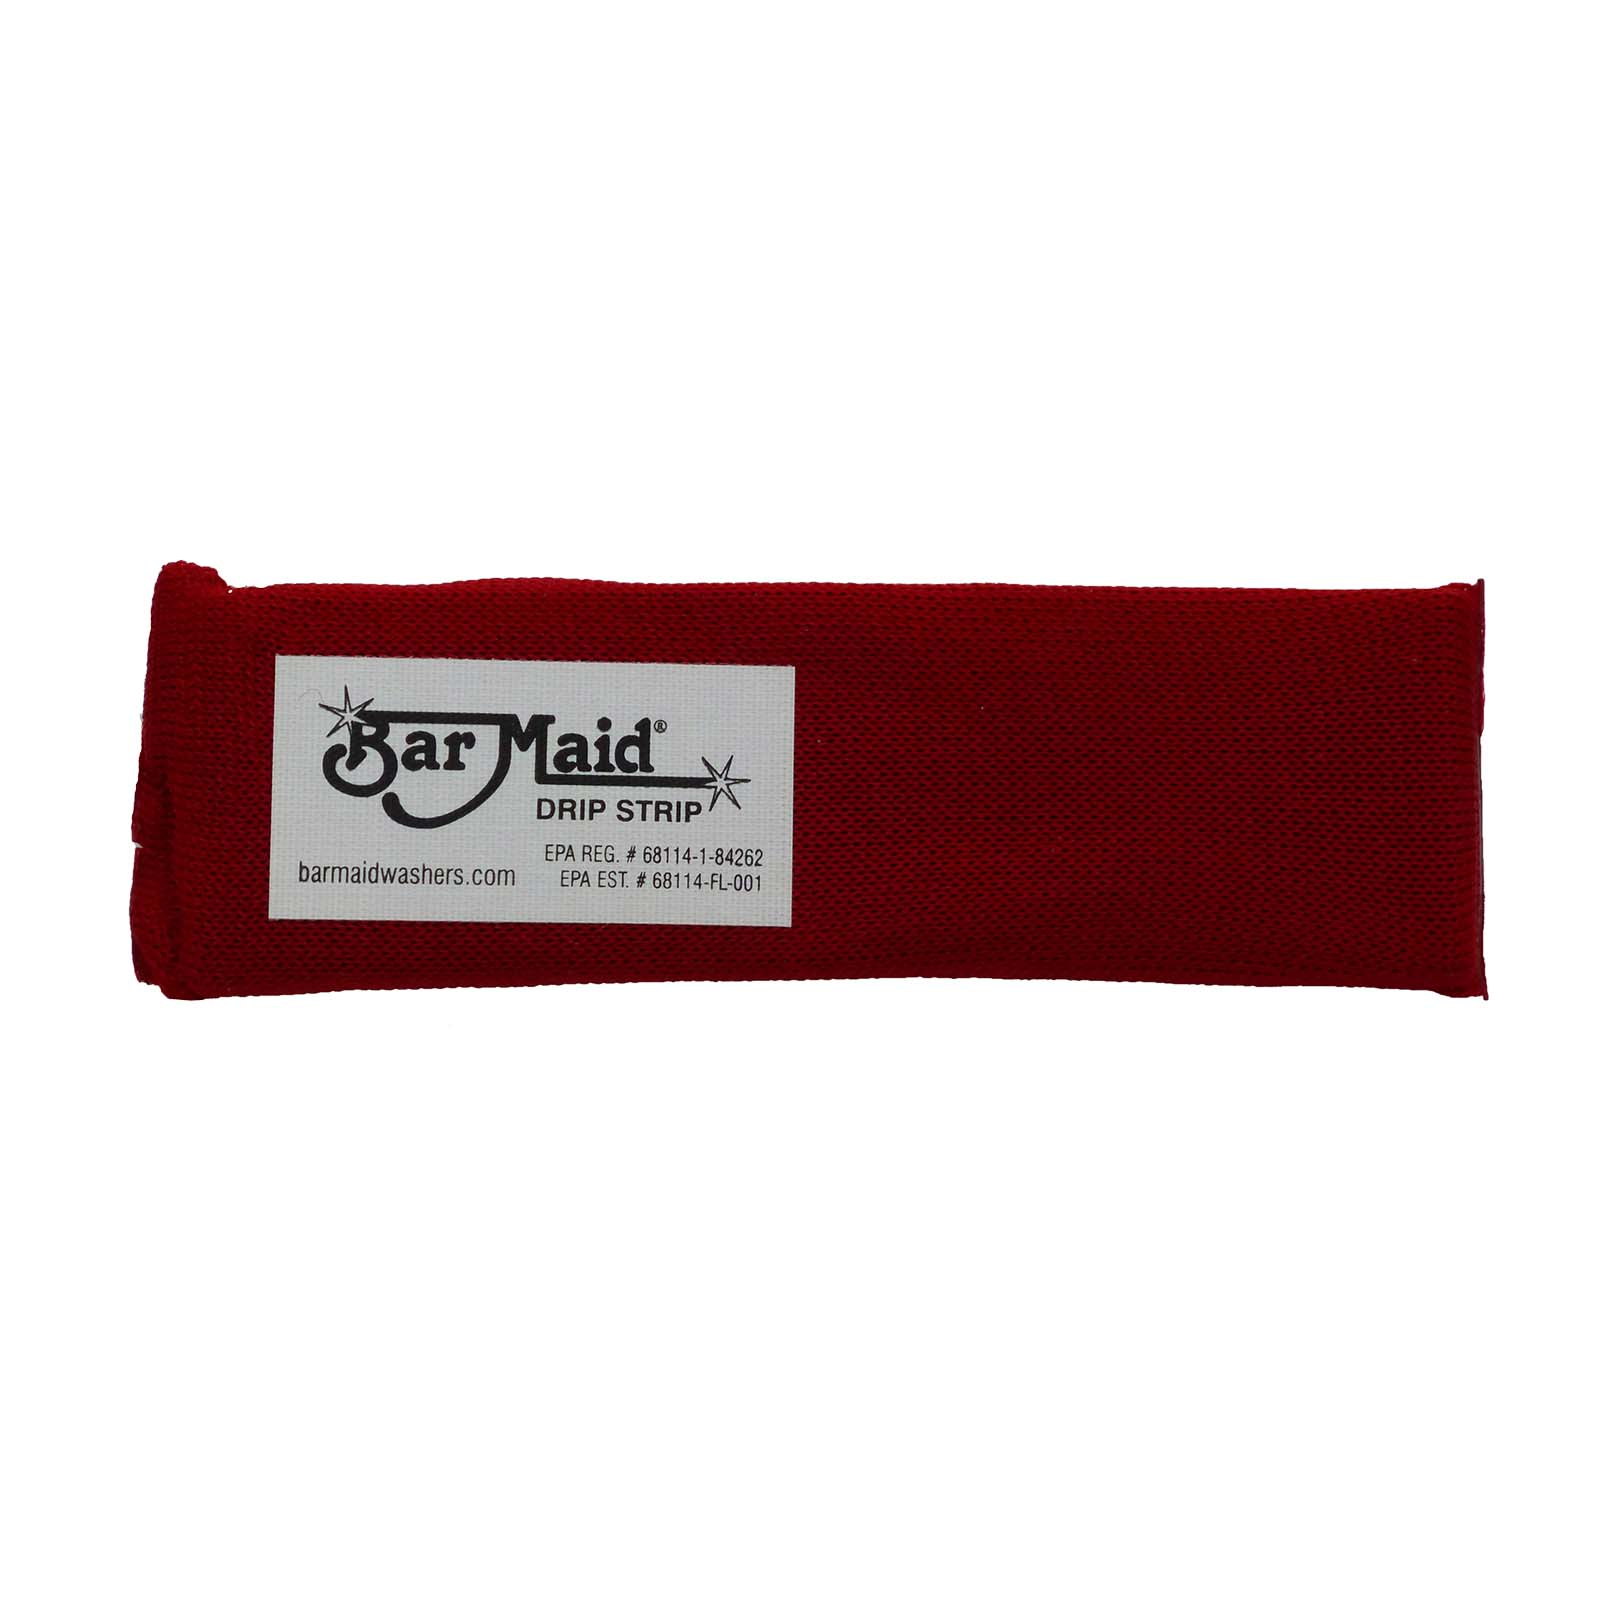 Bar Maid Tap Strip Bar Maid Beer Drip Tray Sanitizer Strip